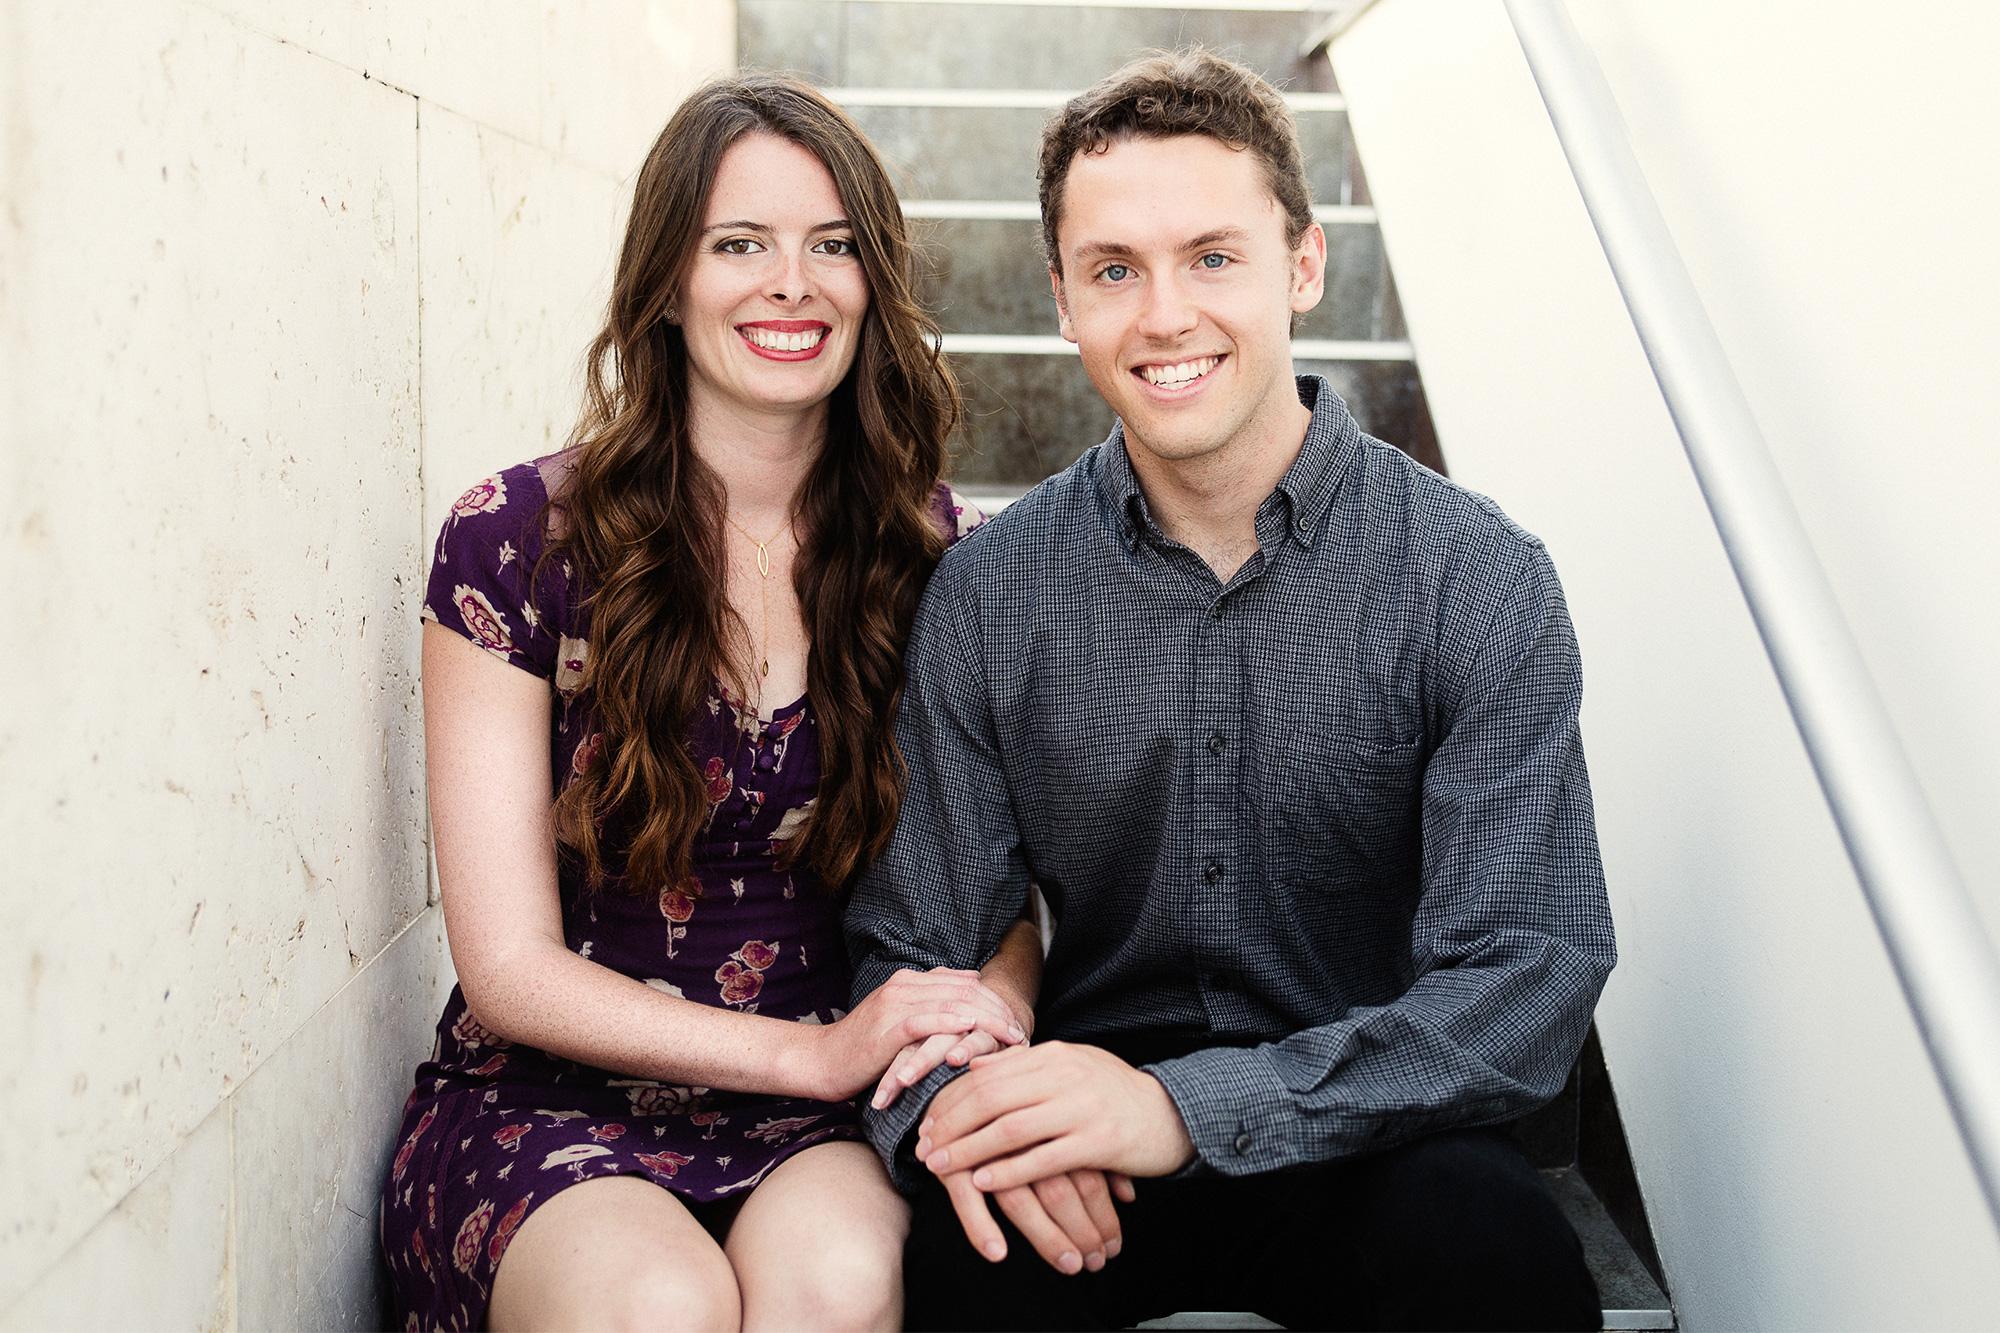 Emily Wibberley and Austin Siegemund-Broka